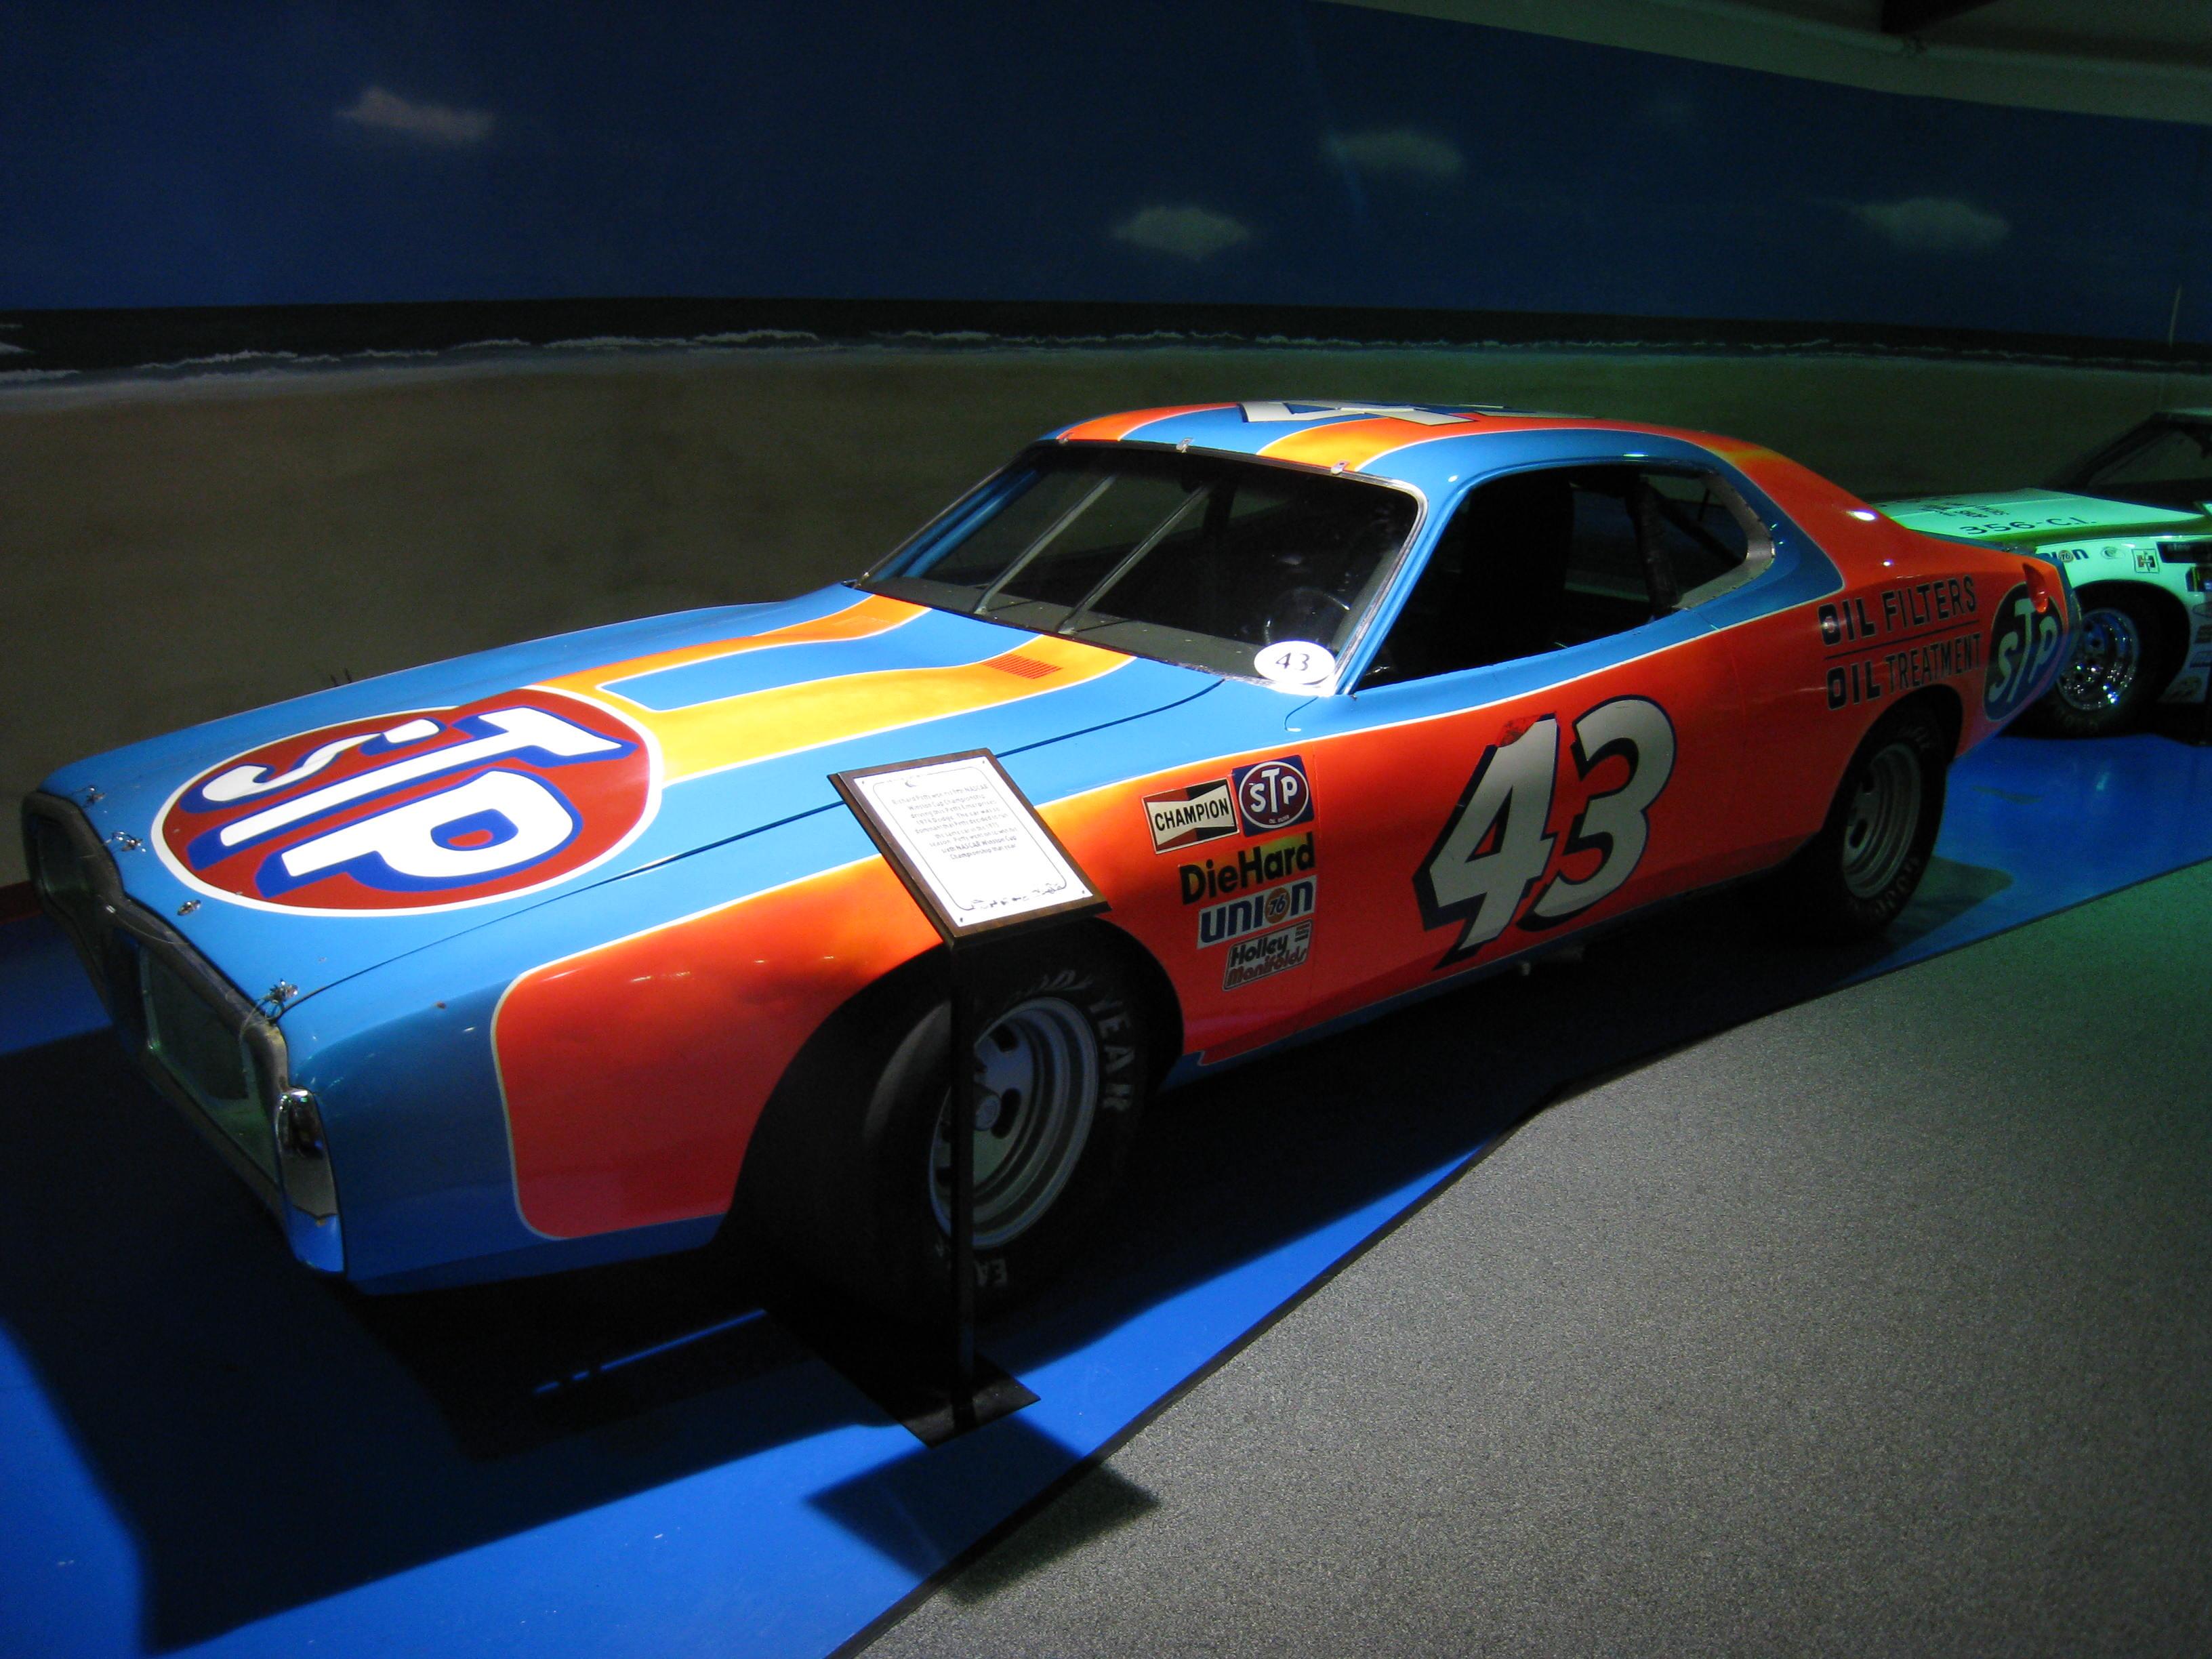 File:NASCAR 43.jpg - Wikimedia Commons